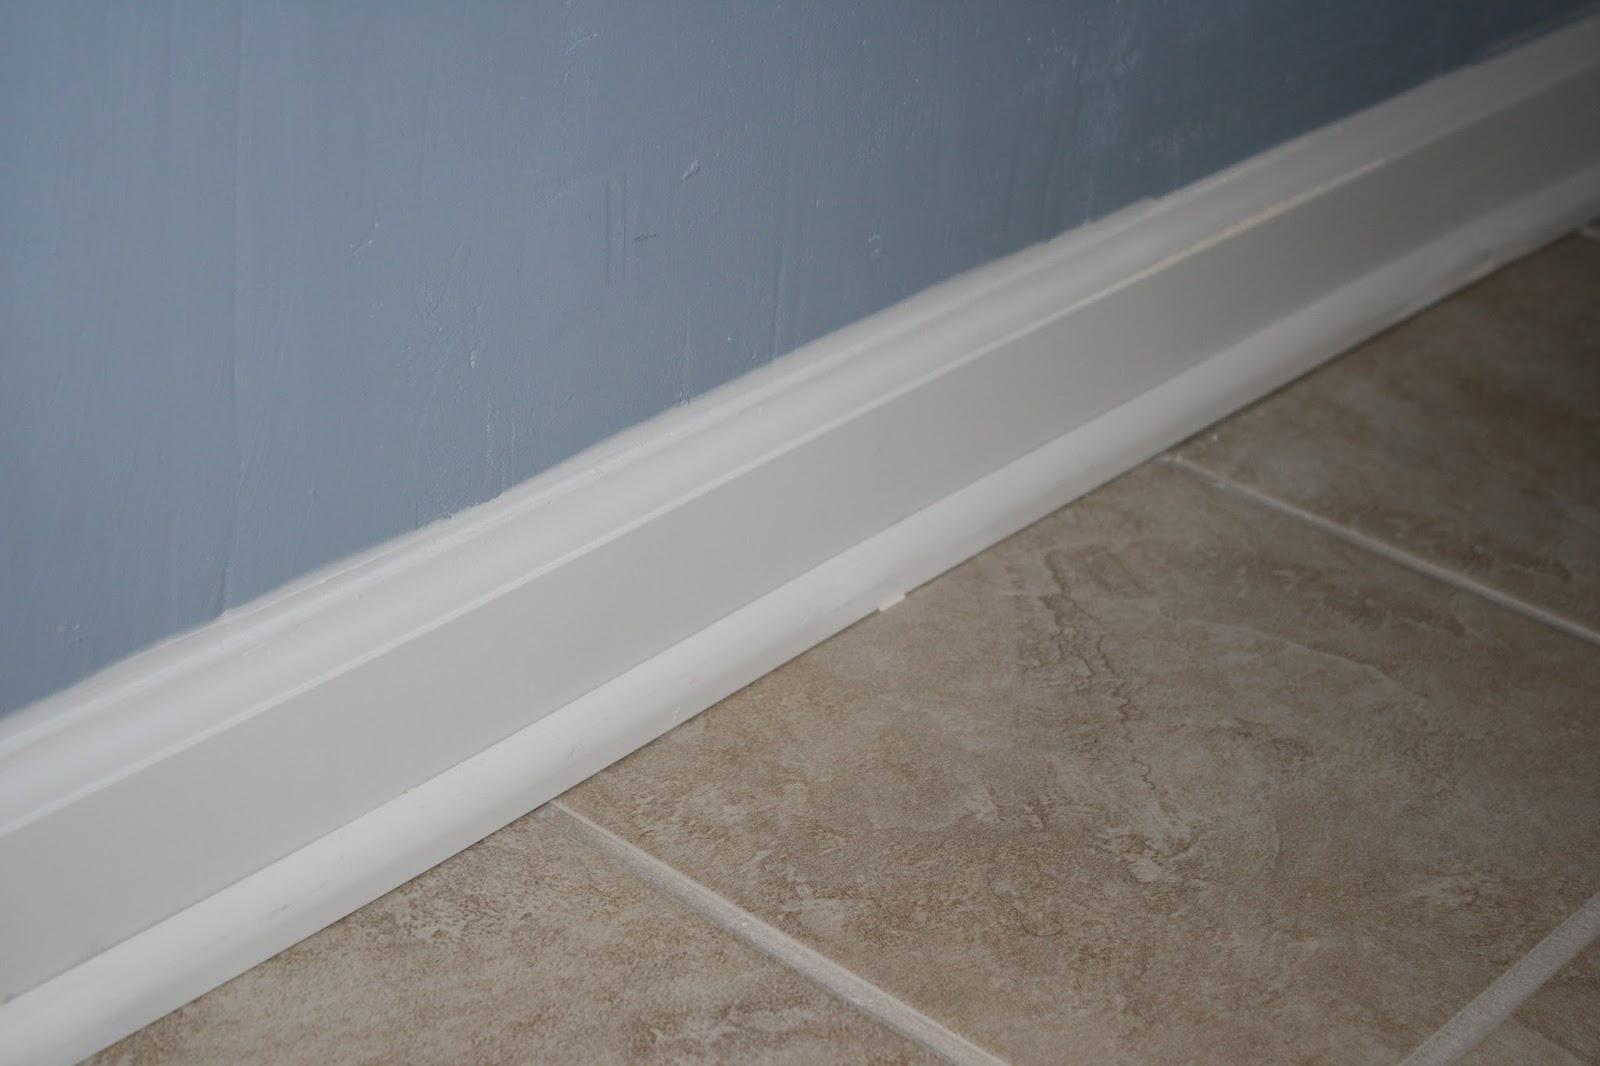 Caulk Baseboard To Tile Floor Tile Design Ideas